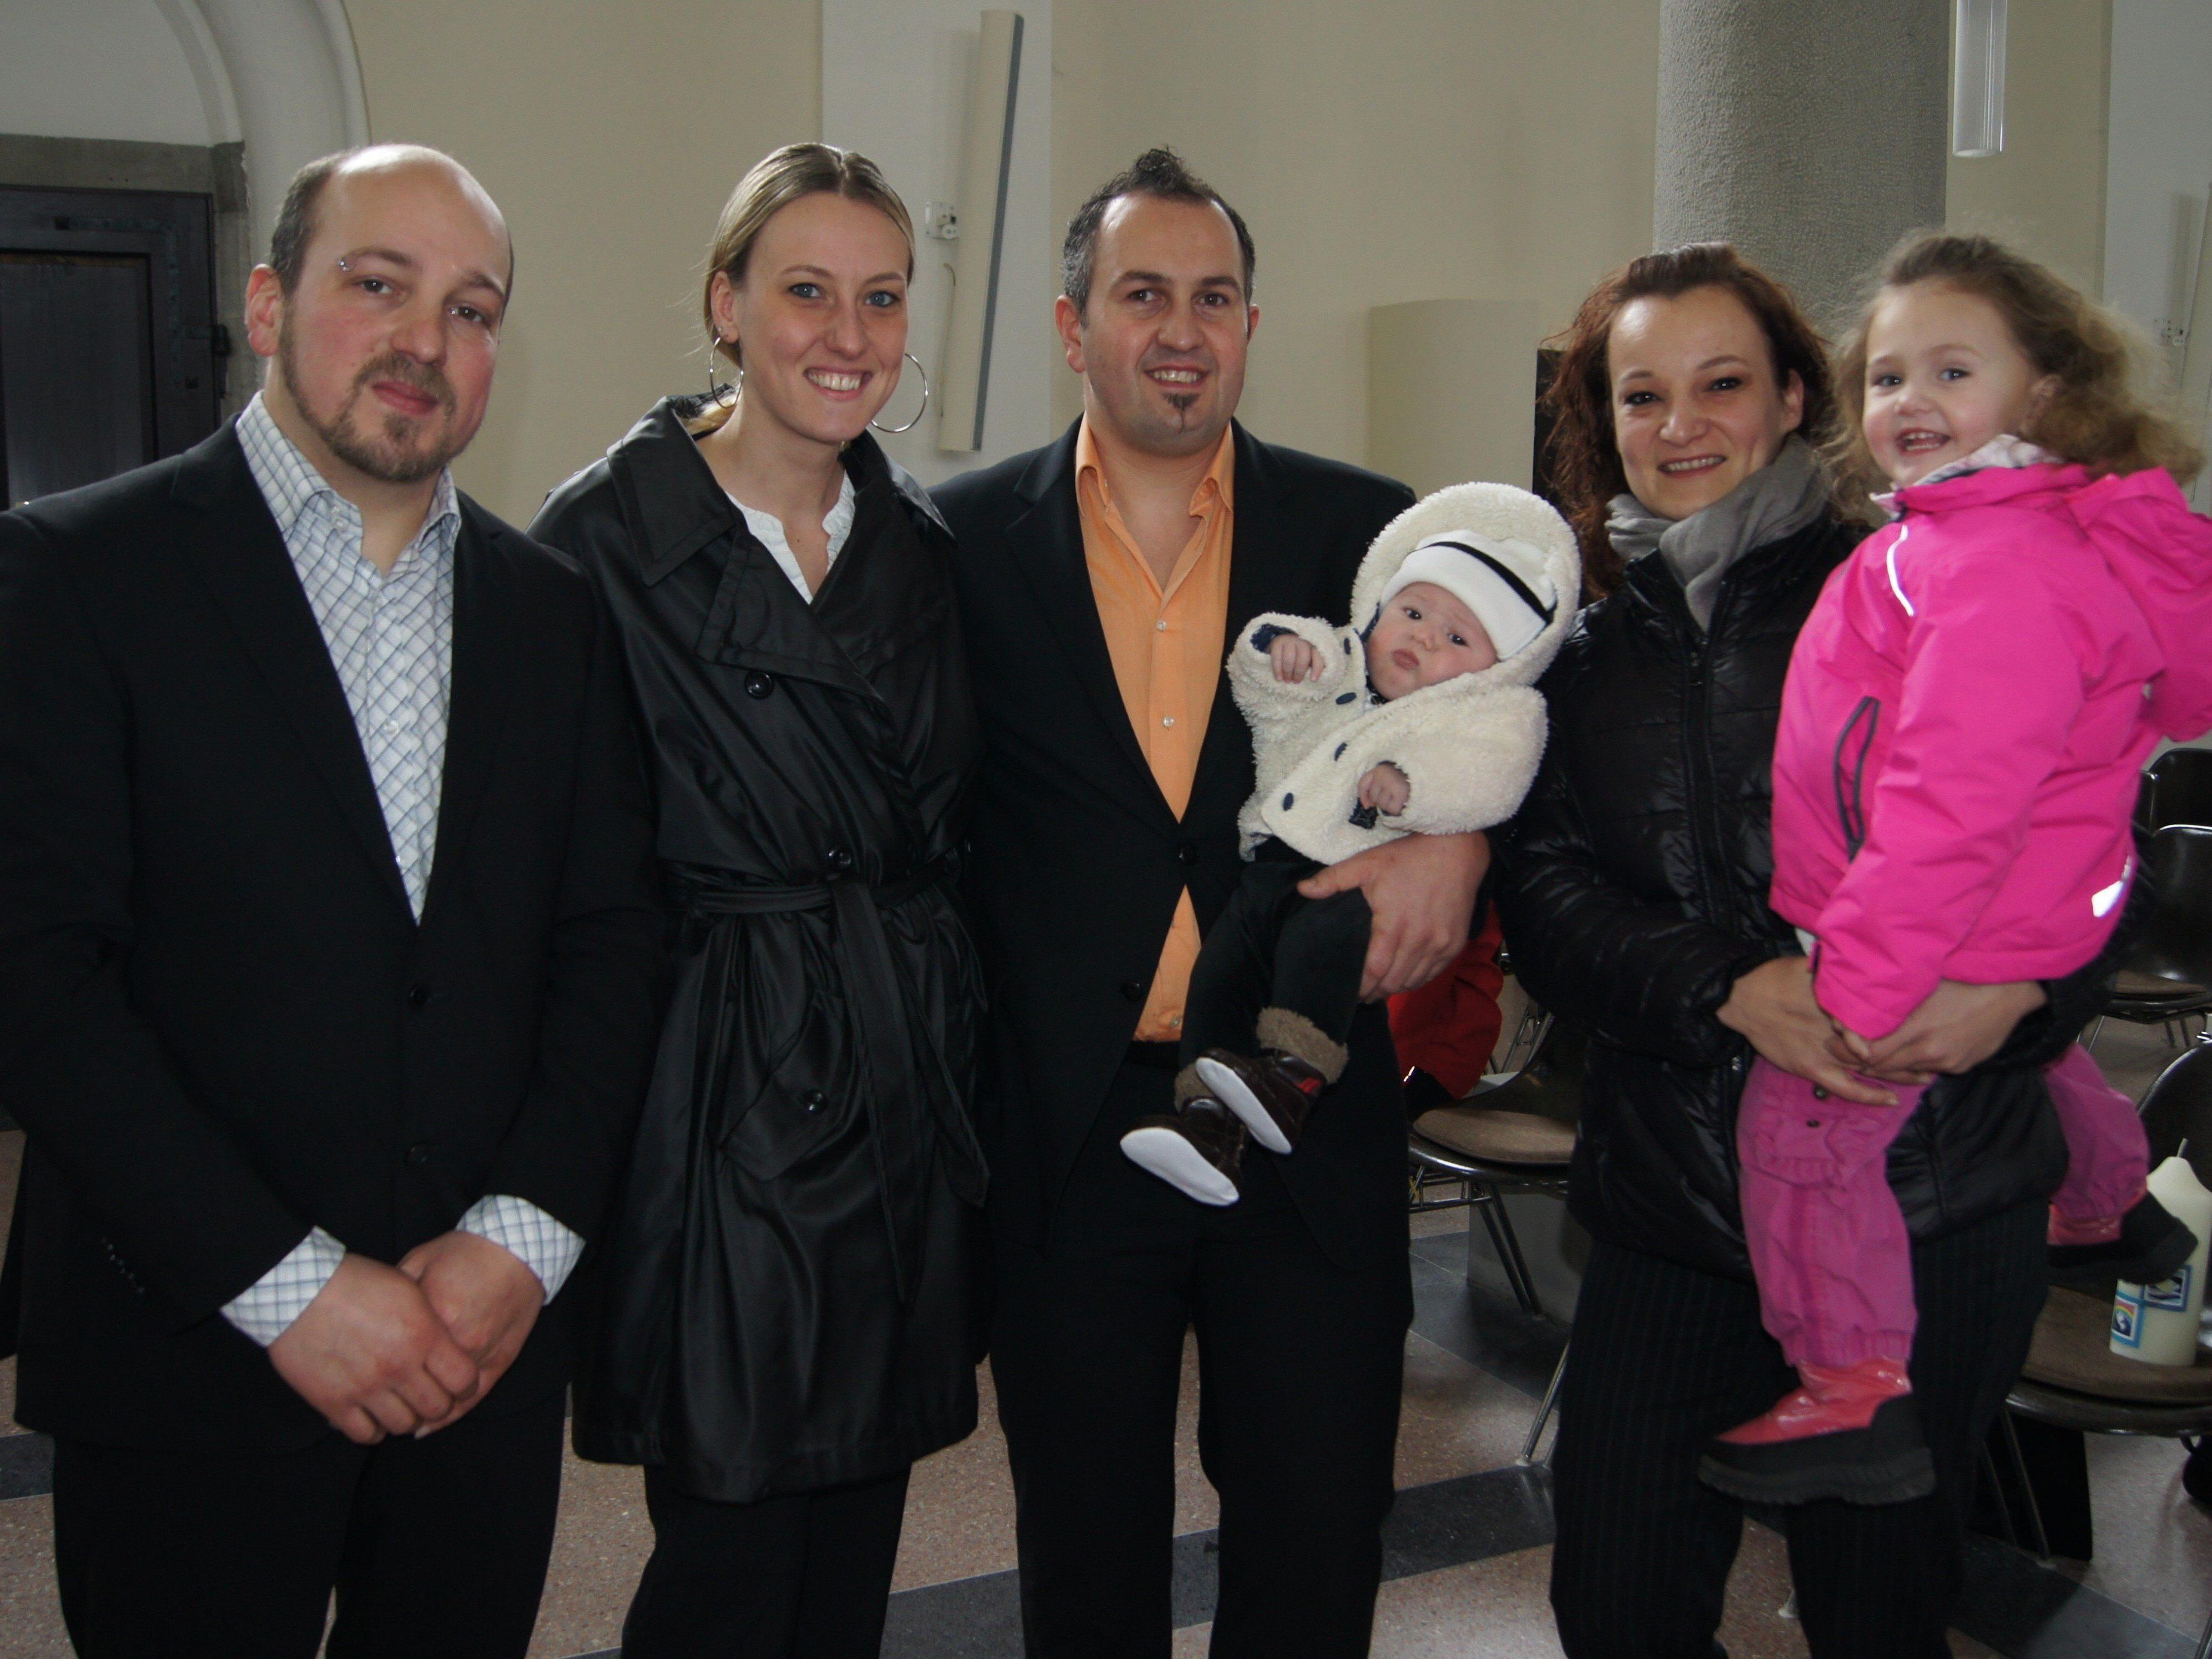 Taufe von Maximilian Mobers in der Pfarrkirche Hard.